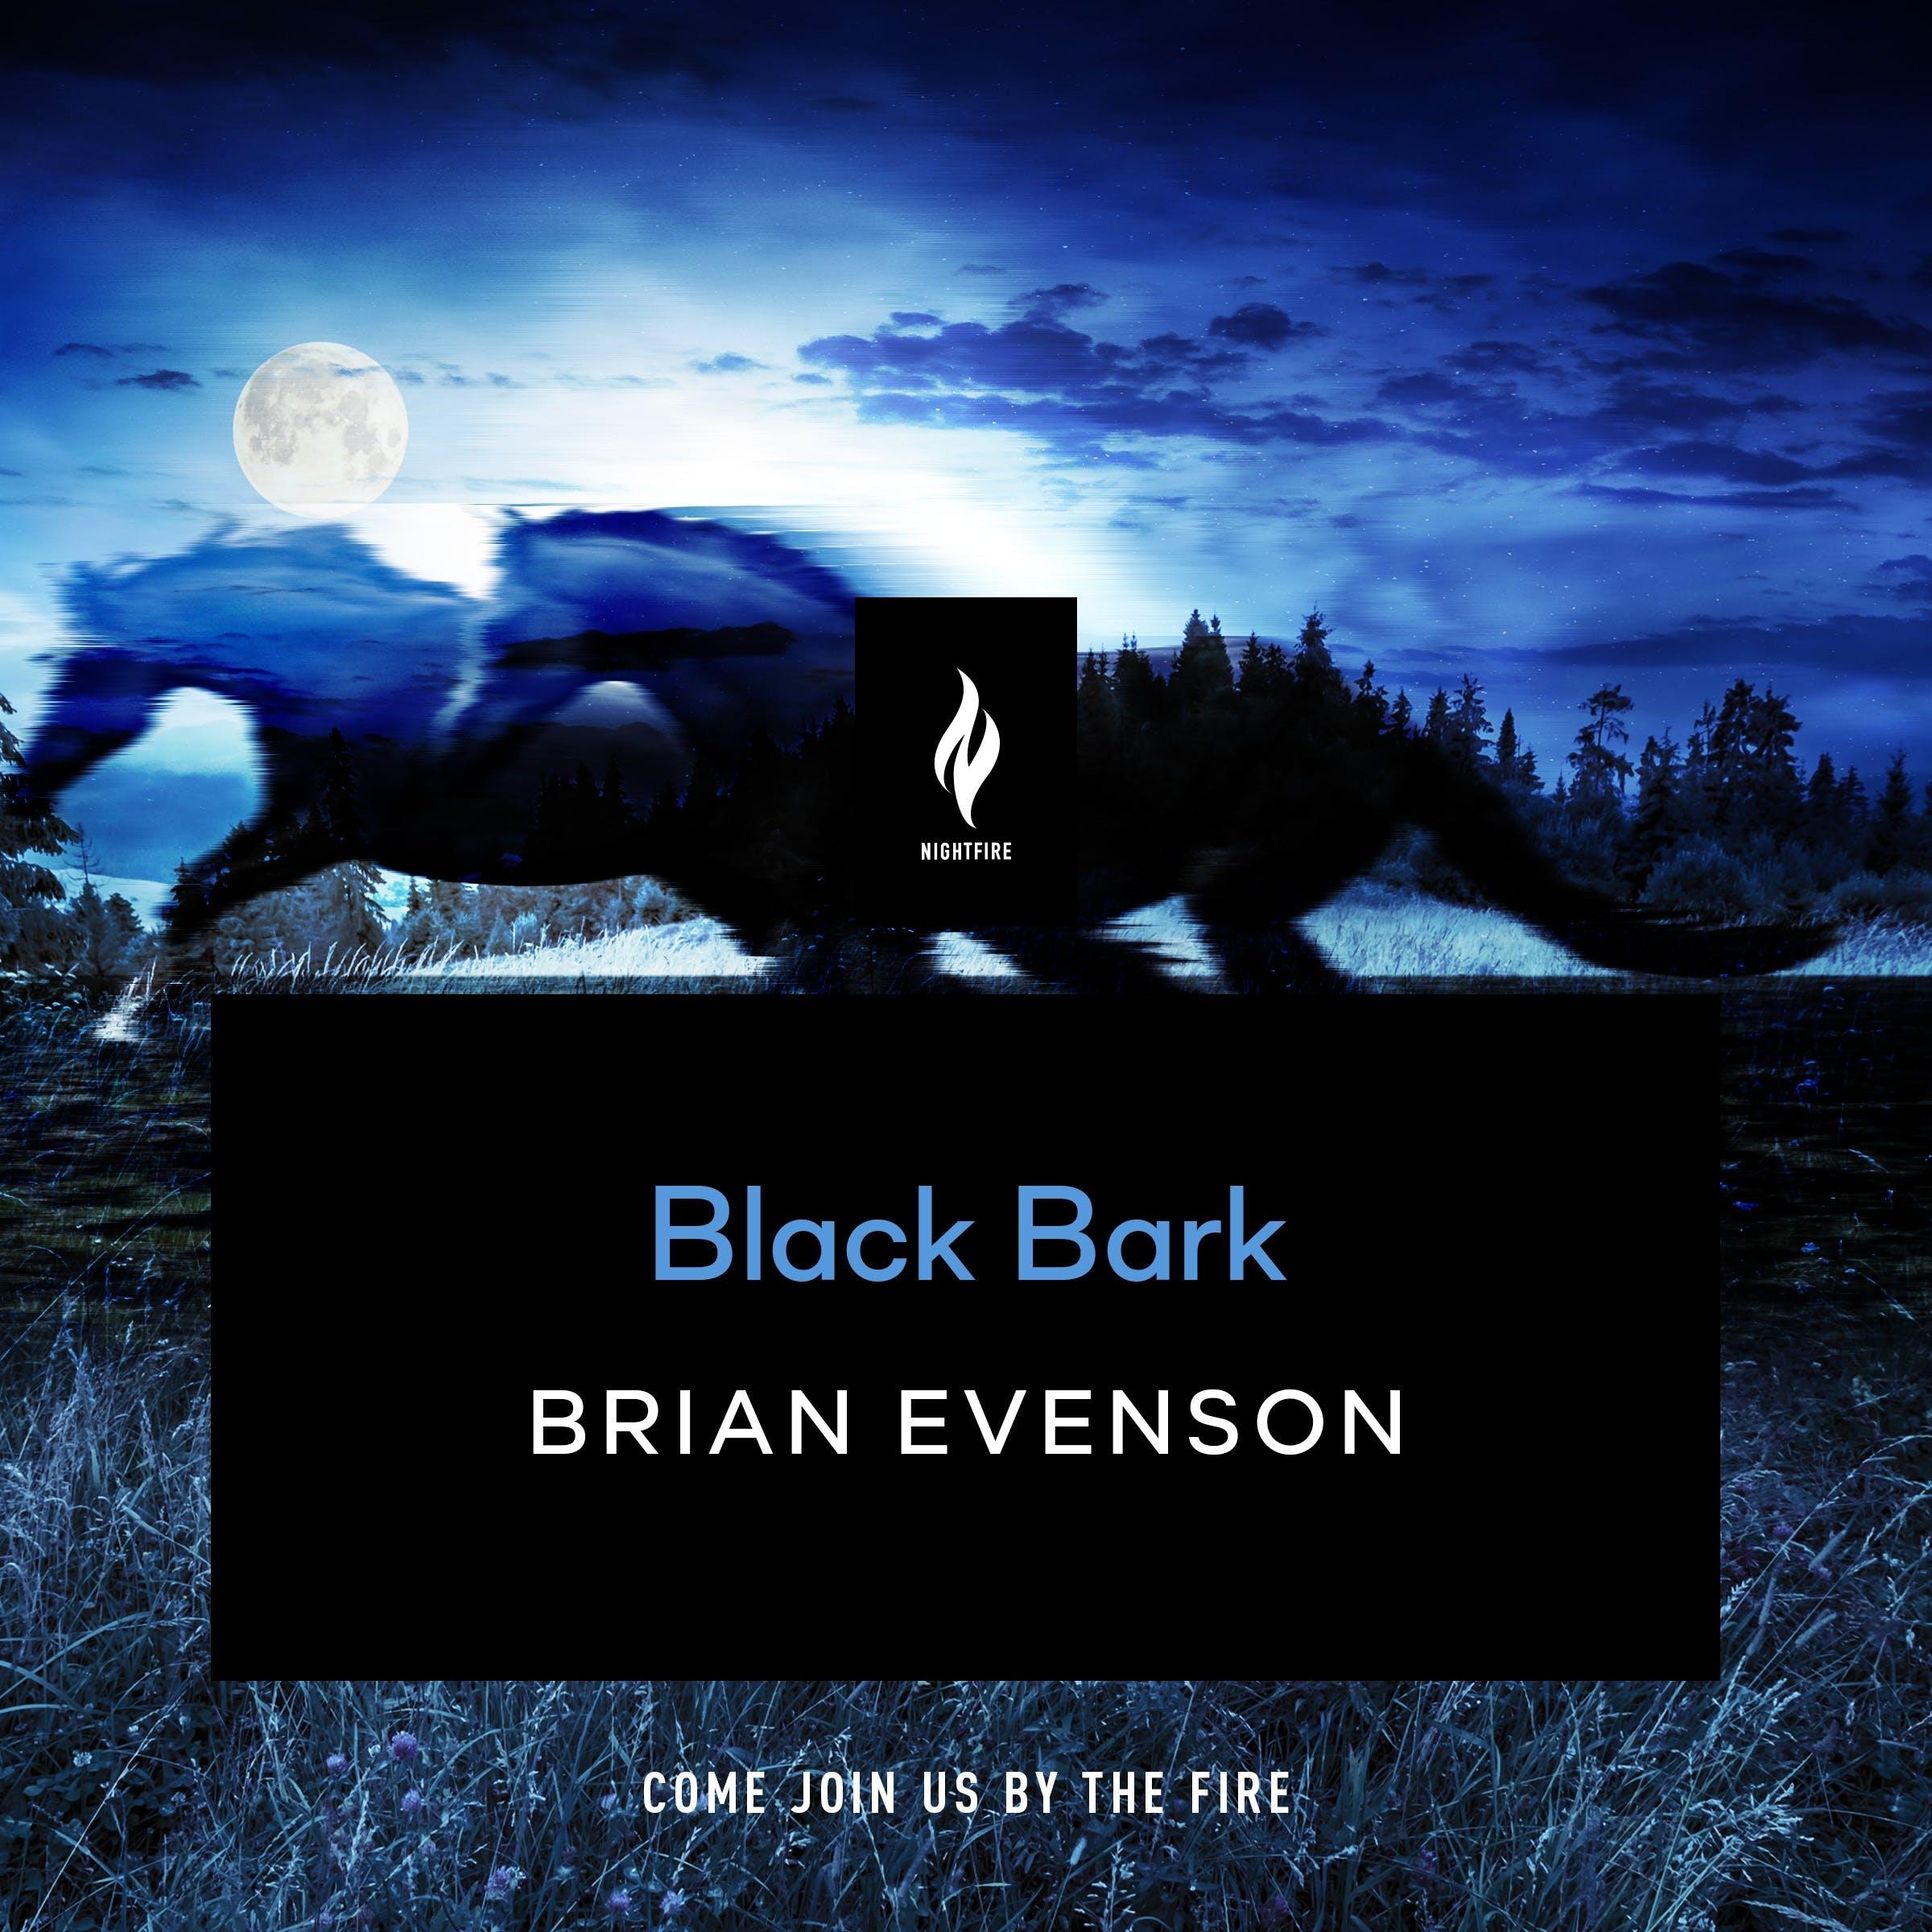 Image of Black Bark